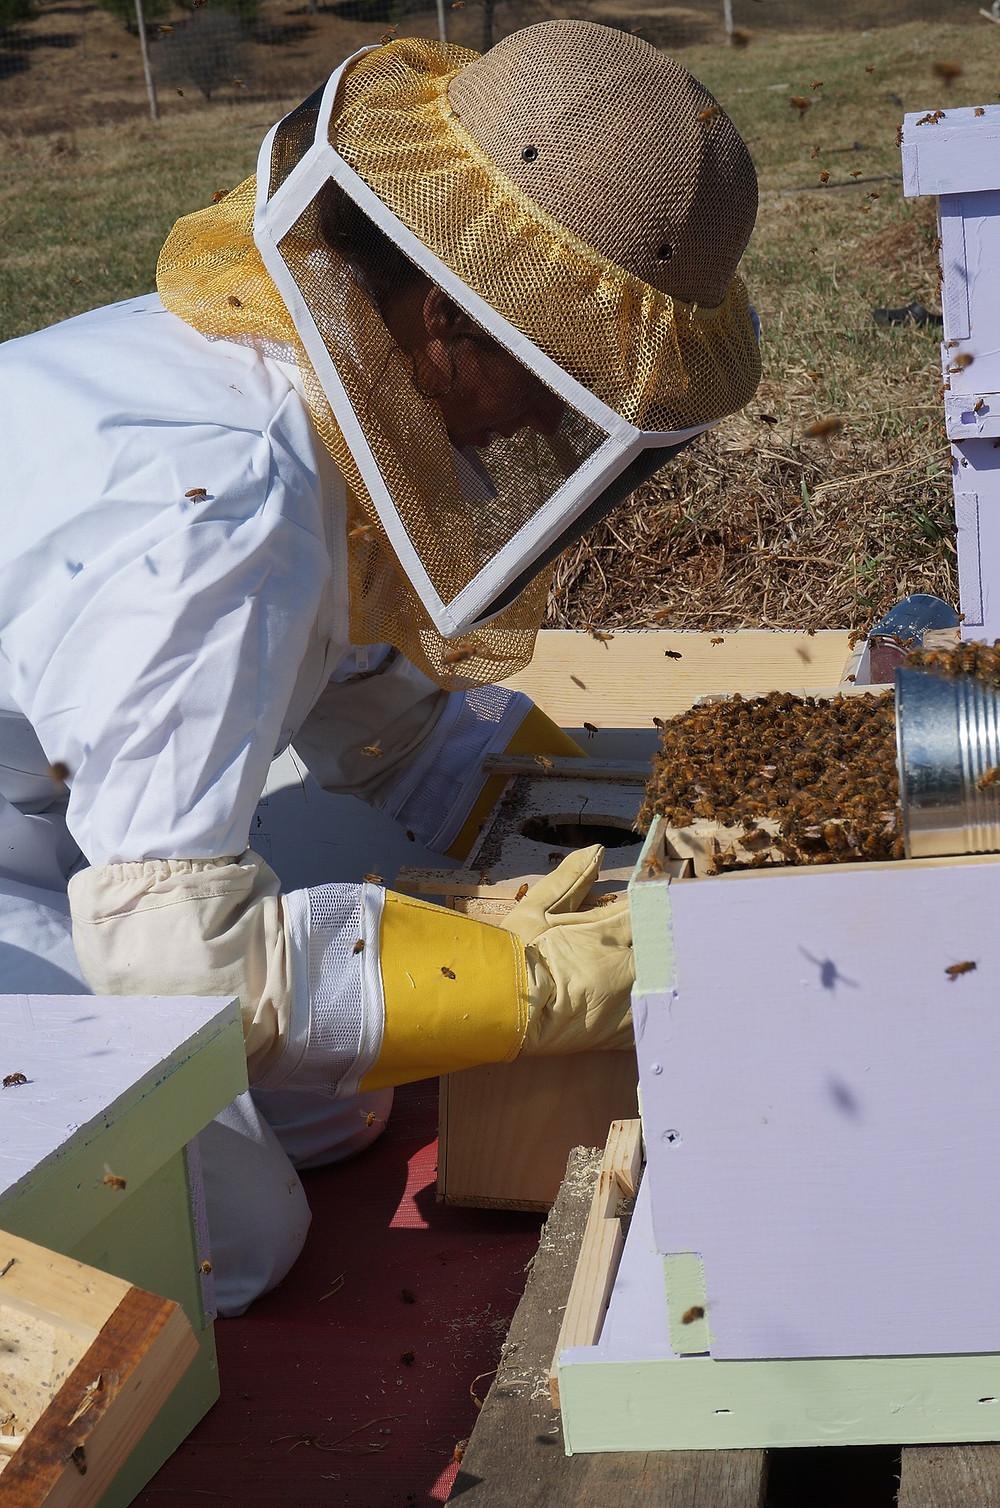 Beekeeper inspecting hive, Ann Arbor MI